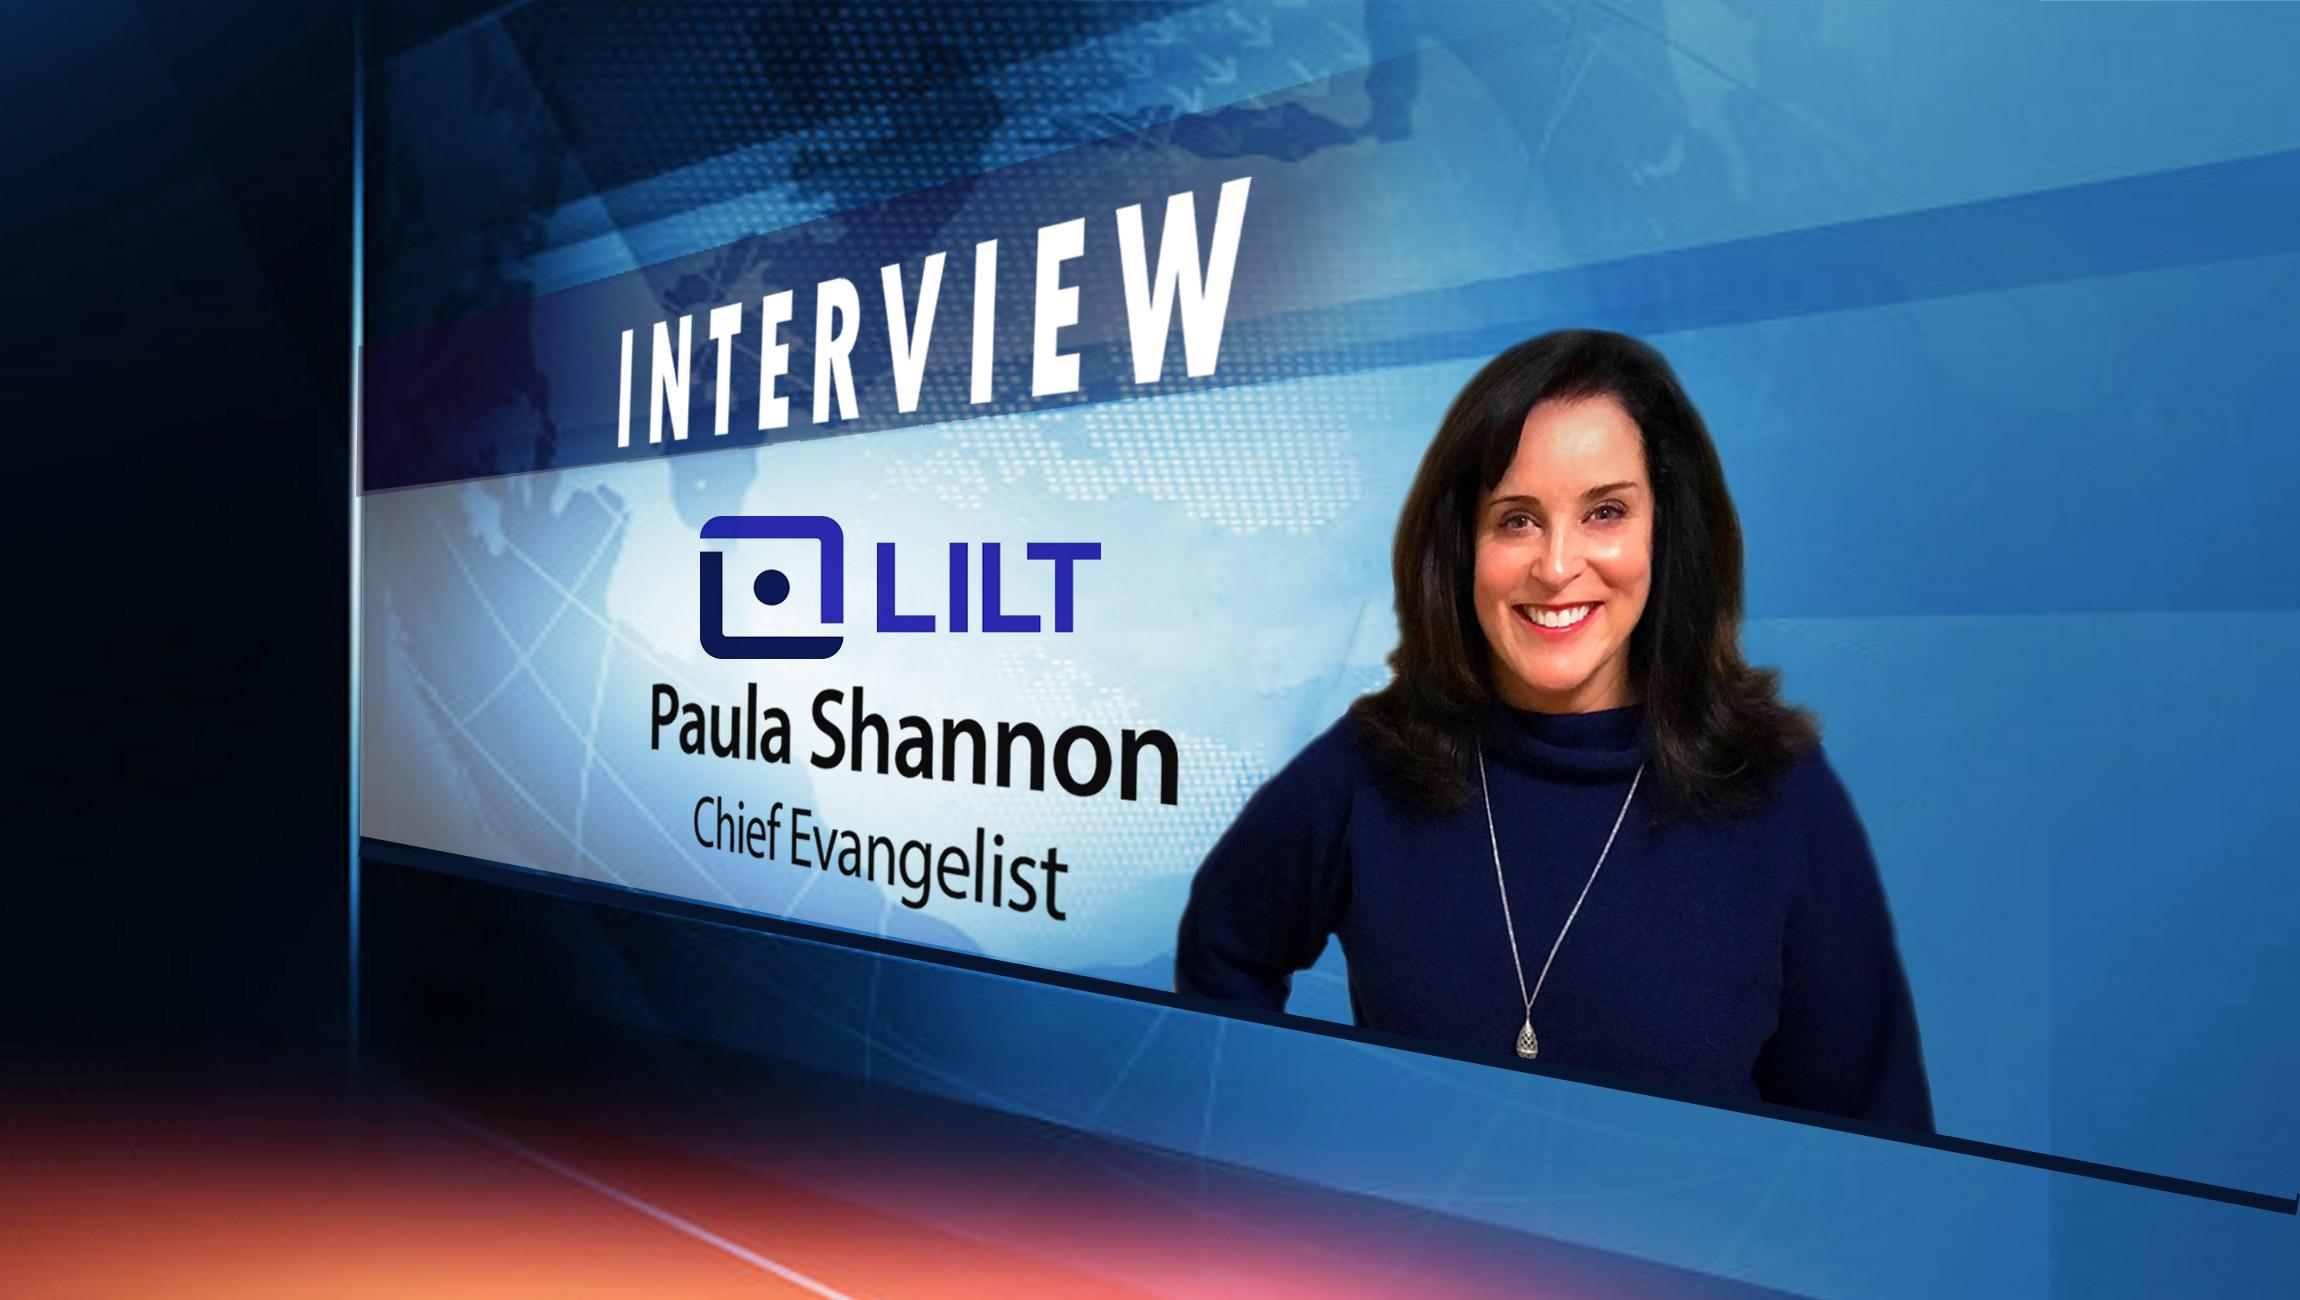 SalesTechStar Interview with Paula Shannon, Chief Evangelist at Lilt